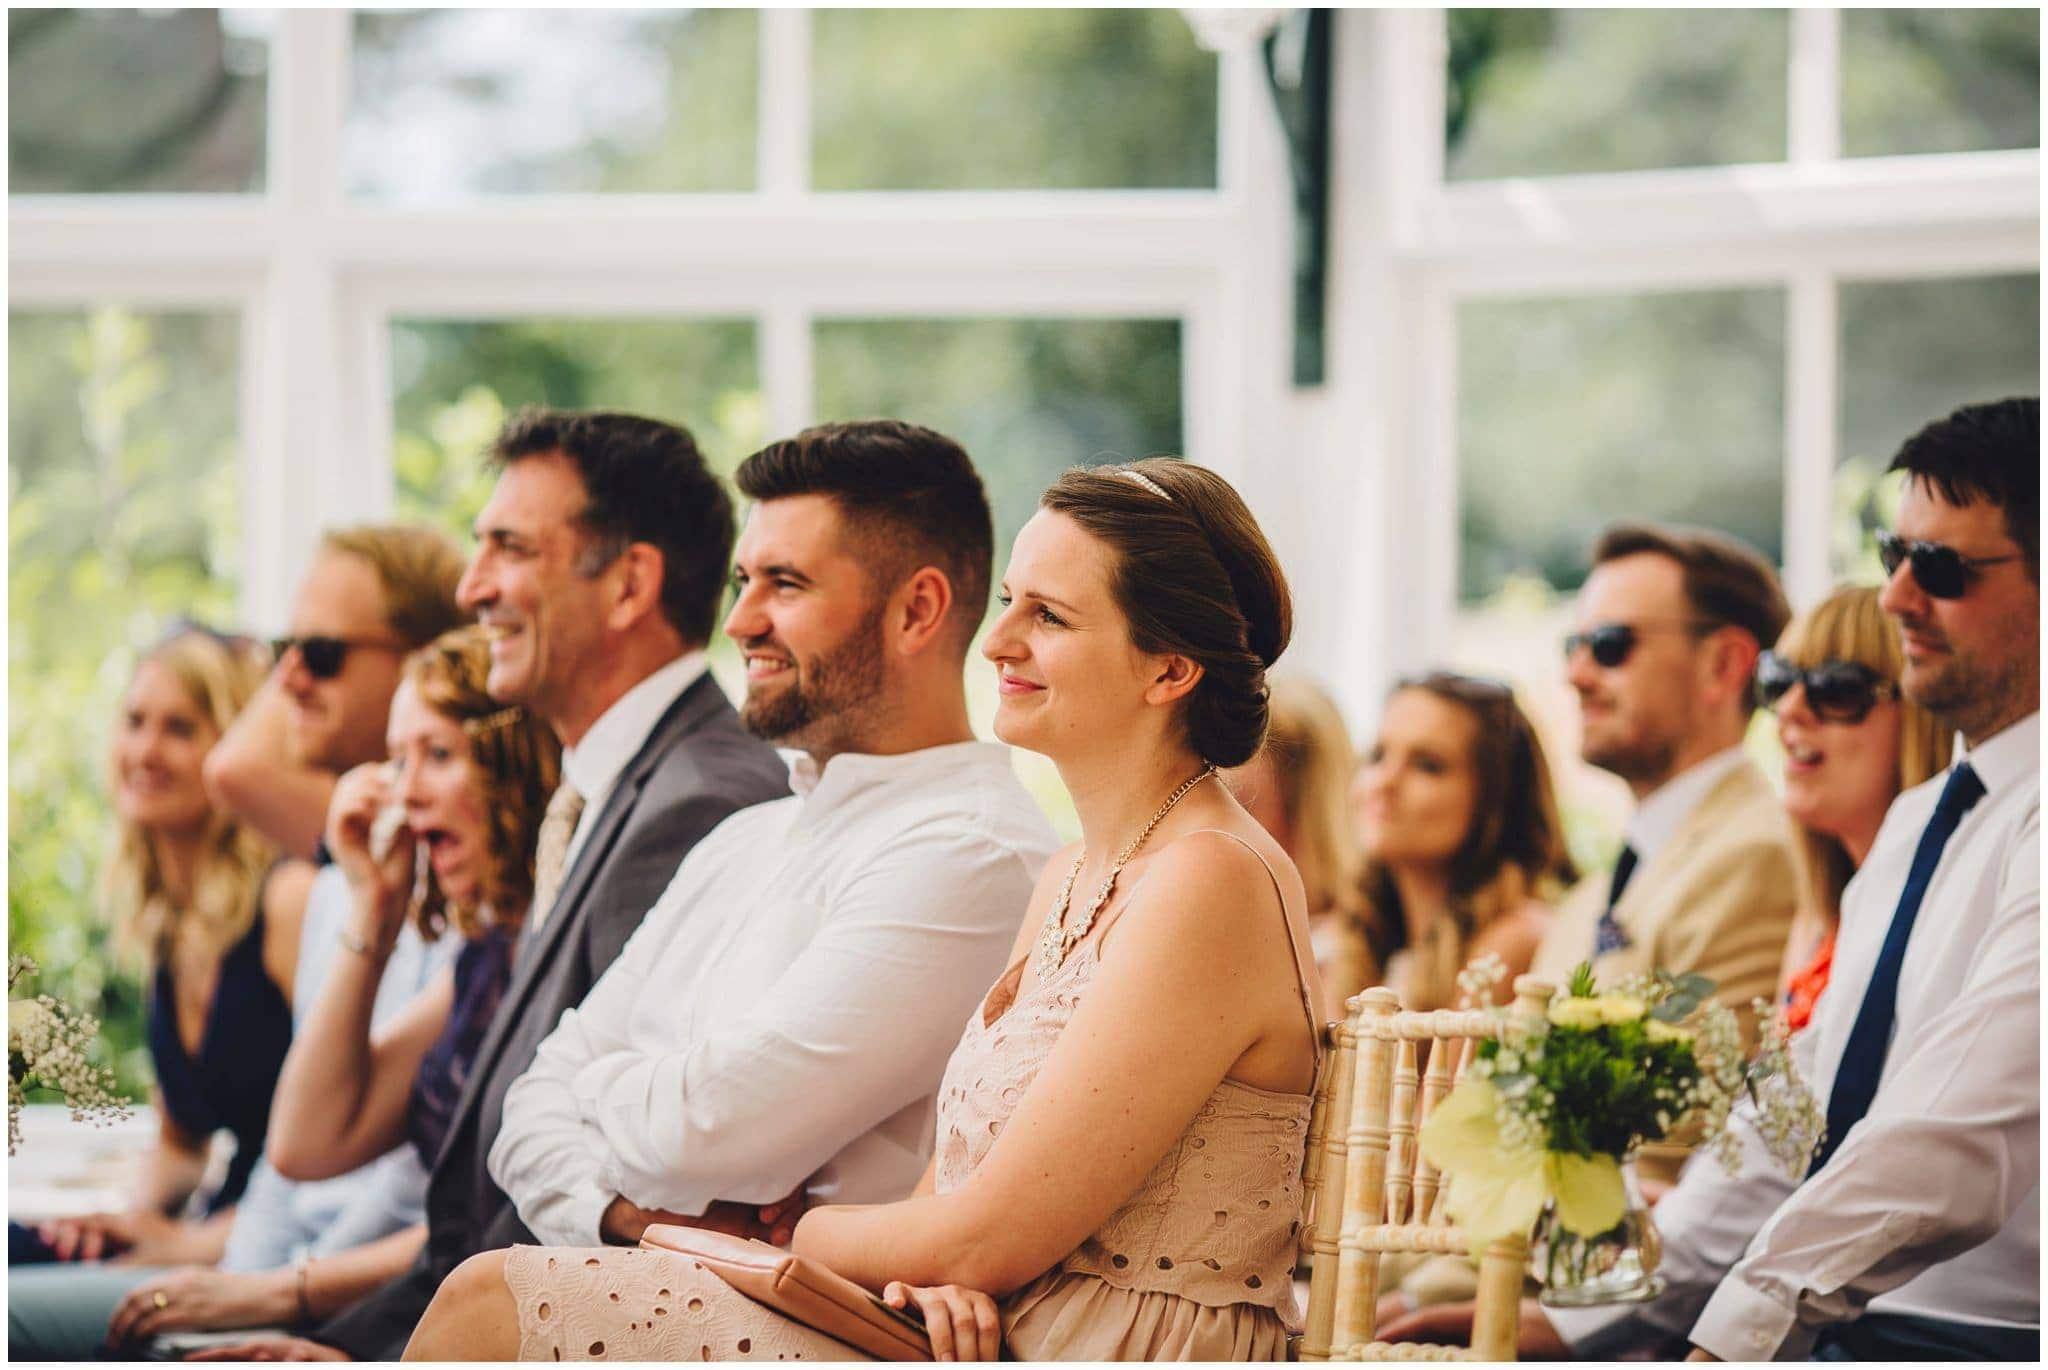 combermere-abbey-wedding-photographer-36